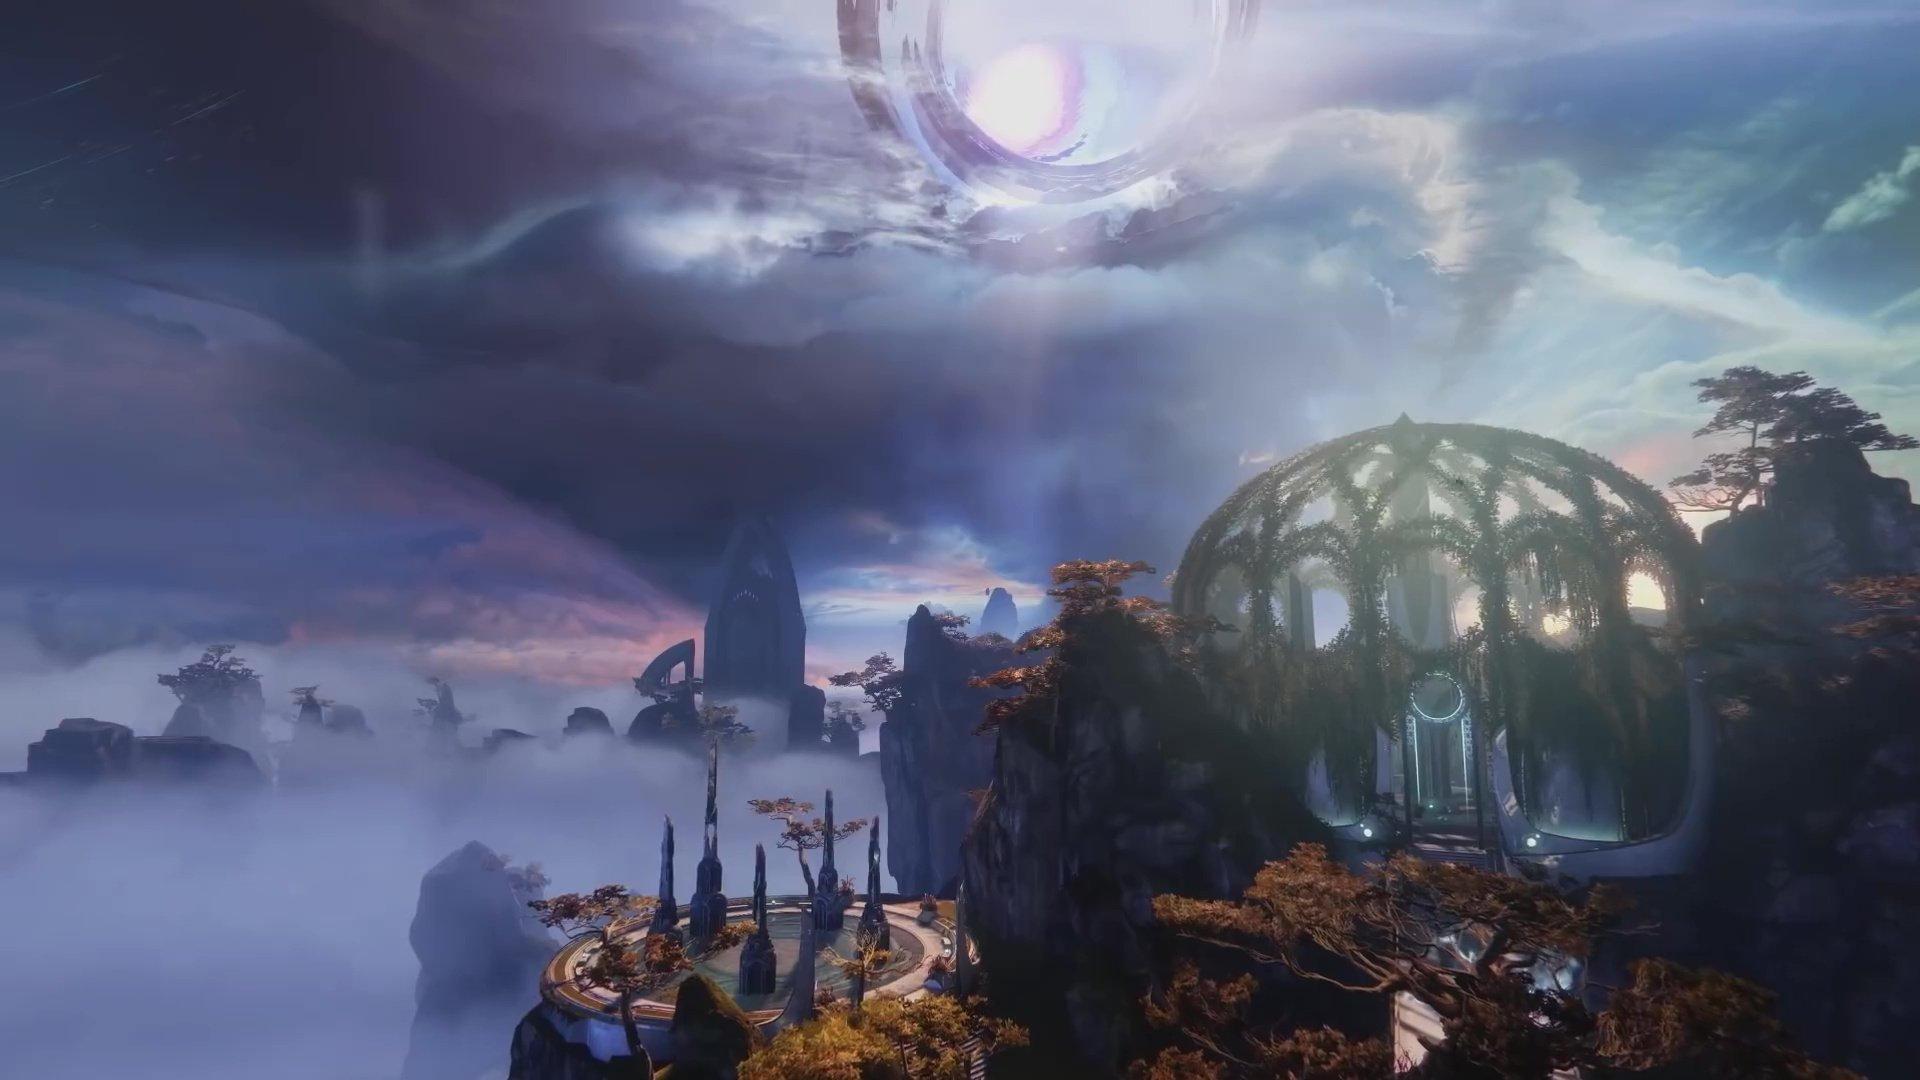 http://images.pushsquare.com/5fe0f4324d42f/destiny-2-forsaken-how-to-access-the-dreaming-city.original.jpg